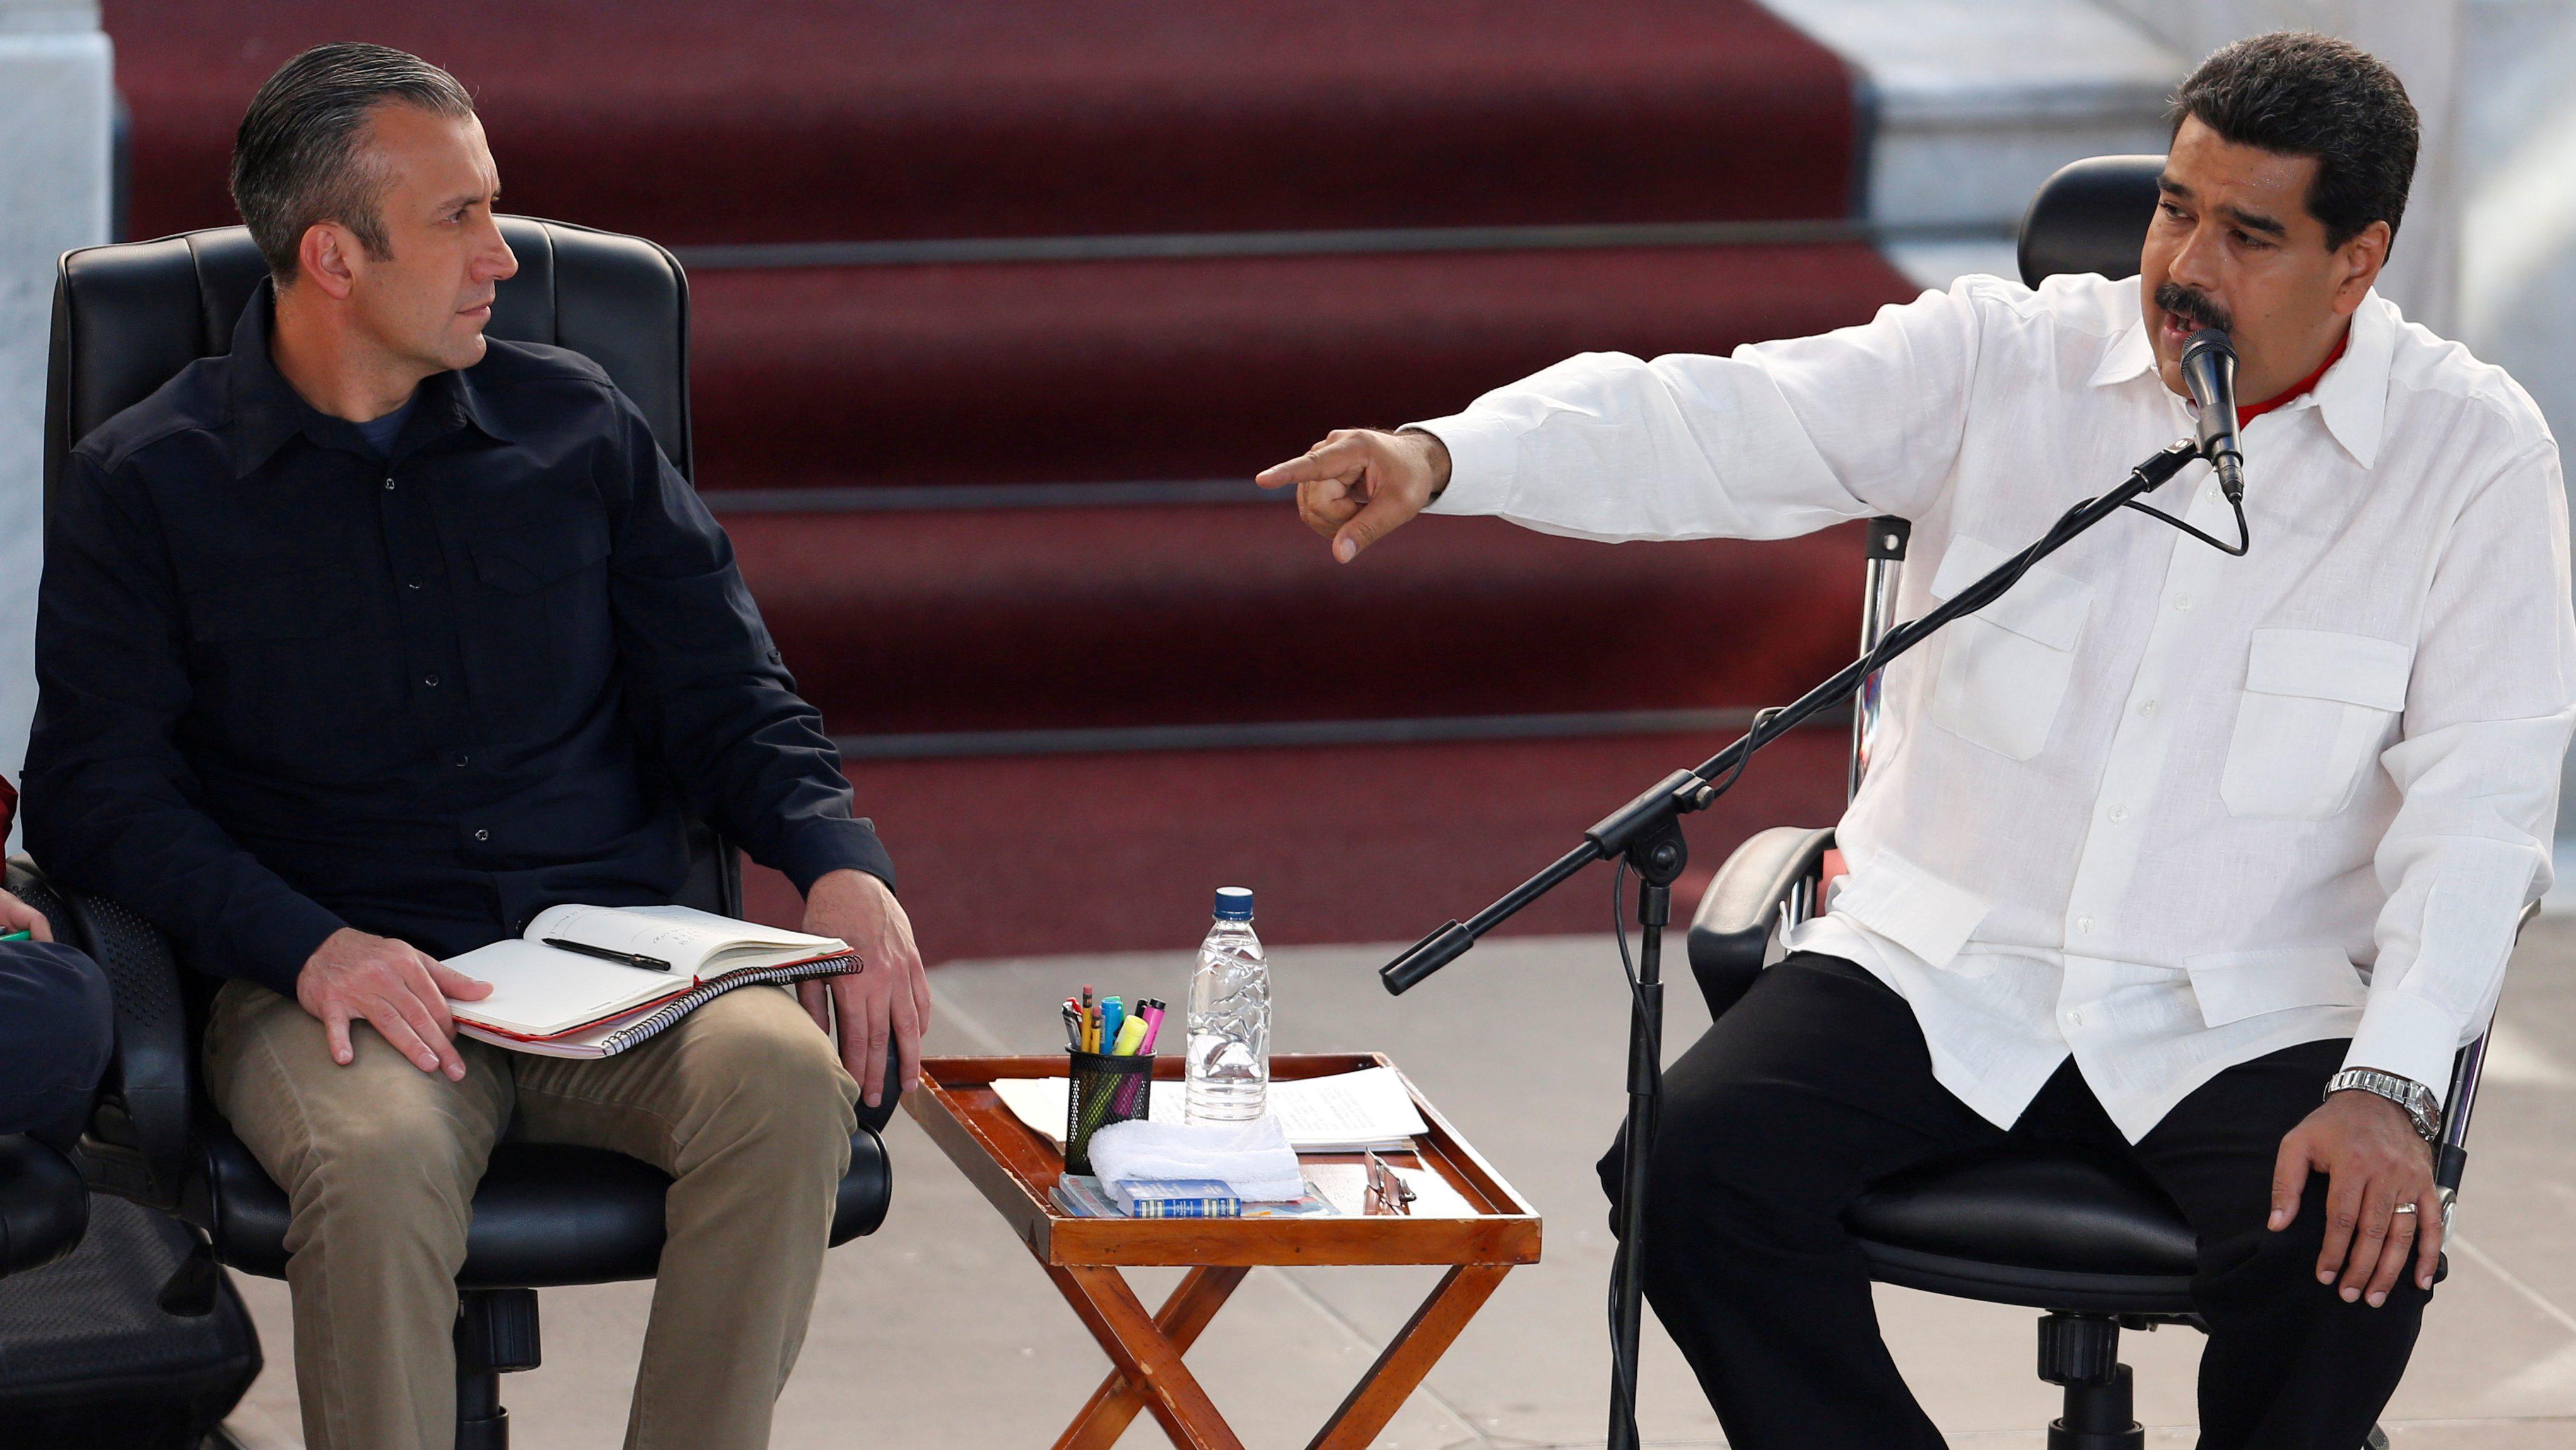 President Nicolas Maduro (R) speaks next to Venezuela's Vice President Tareck El Aissami